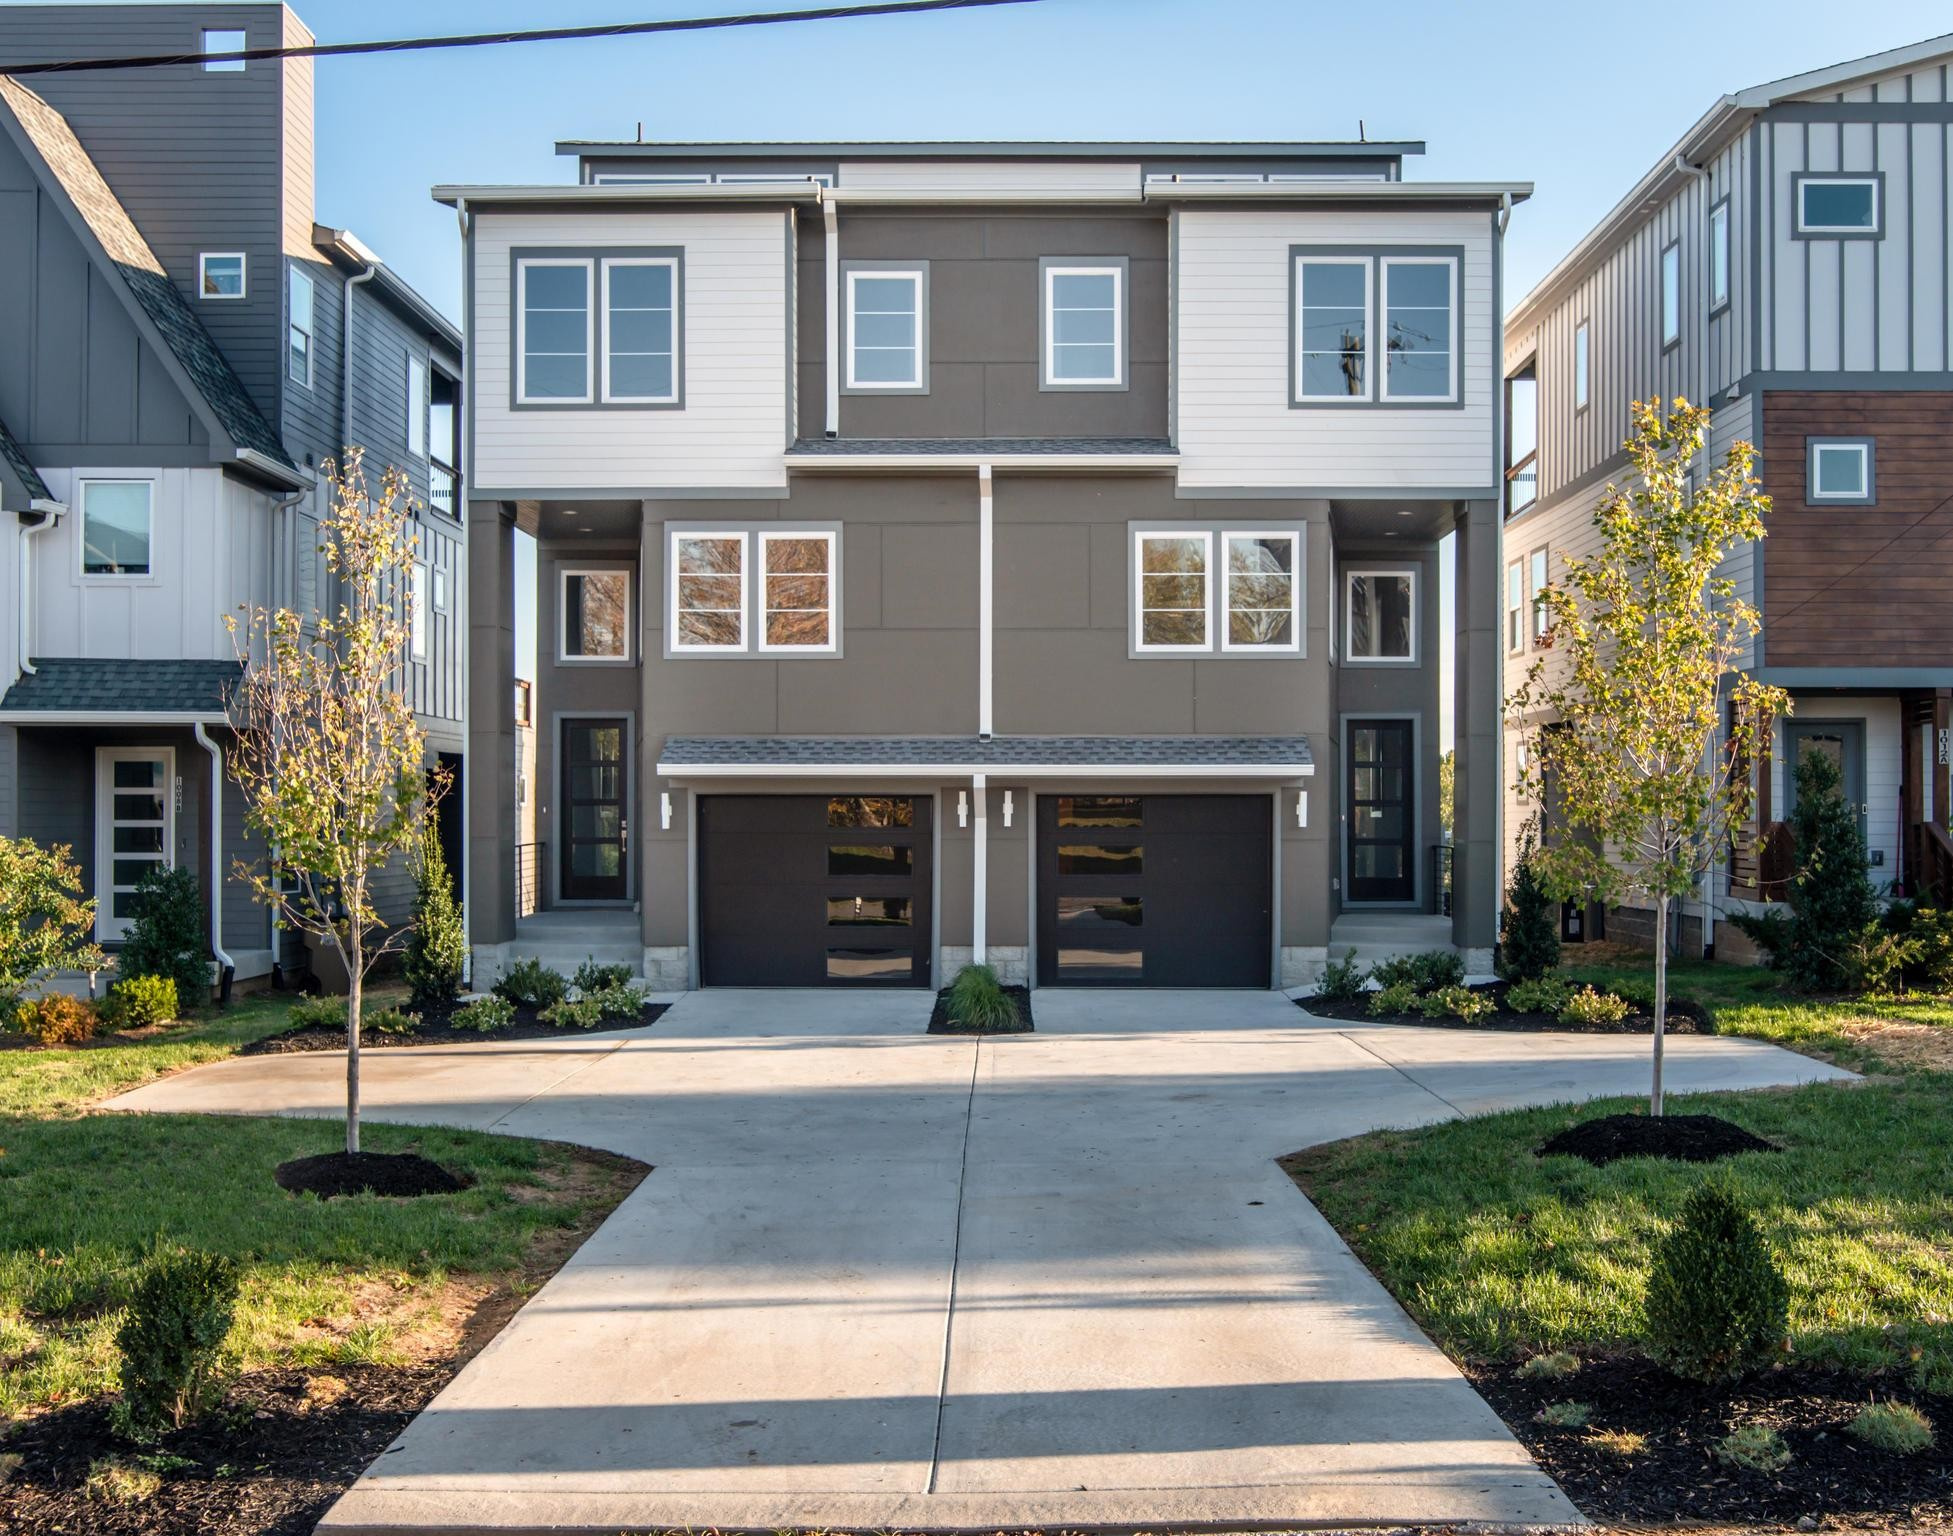 1010 Alice St #A, Nashville, TN 37218 - Nashville, TN real estate listing